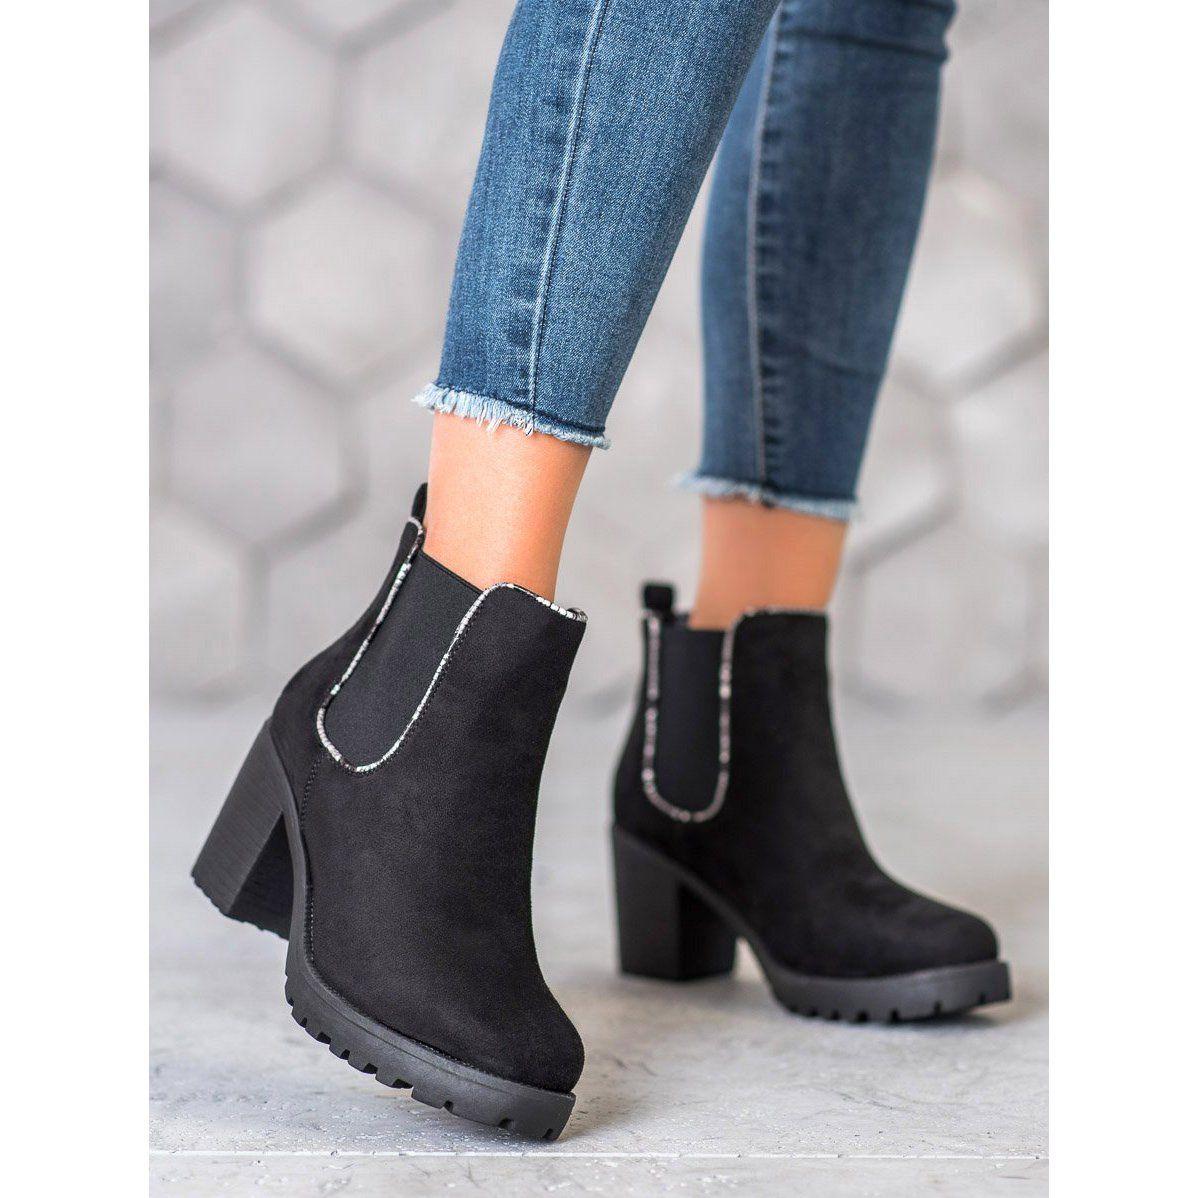 Erynn Zamszowe Sztyblety Na Platformie Czarne Jodhpur Boots Stylish Shoes For Women Boots